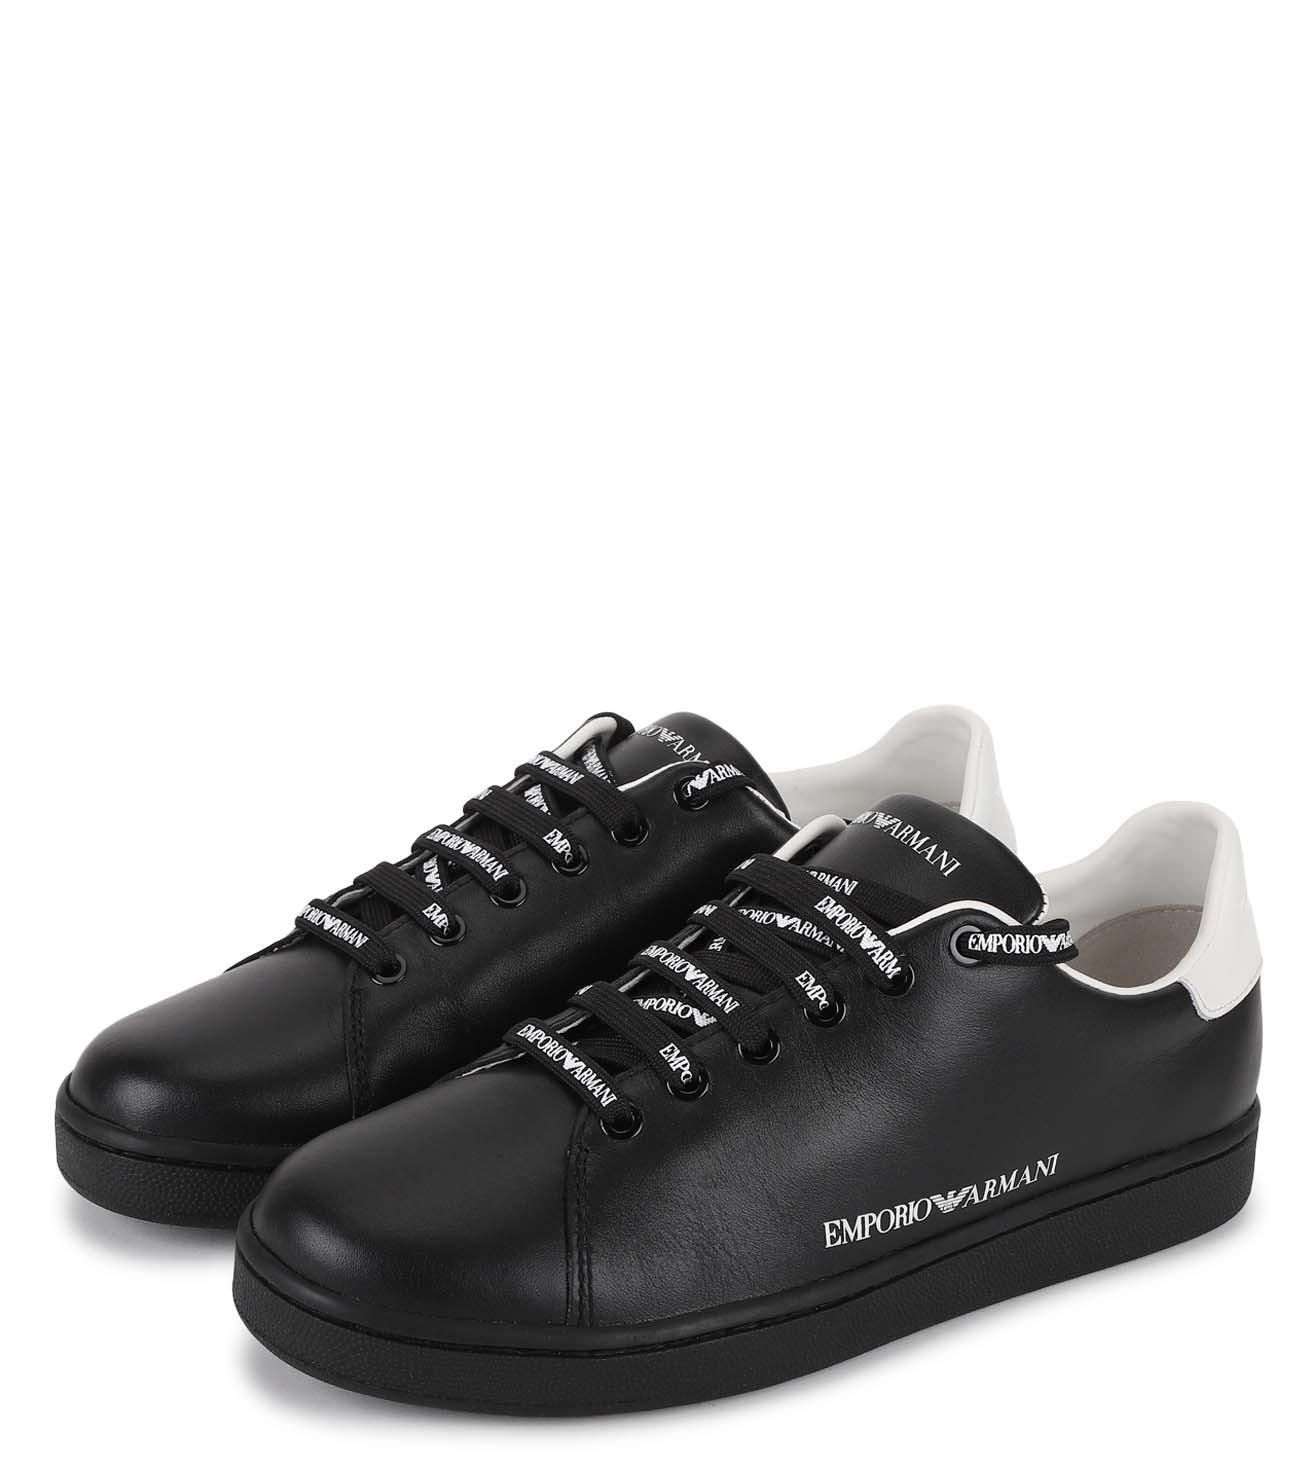 Buy Emporio Armani Black \u0026 White Women